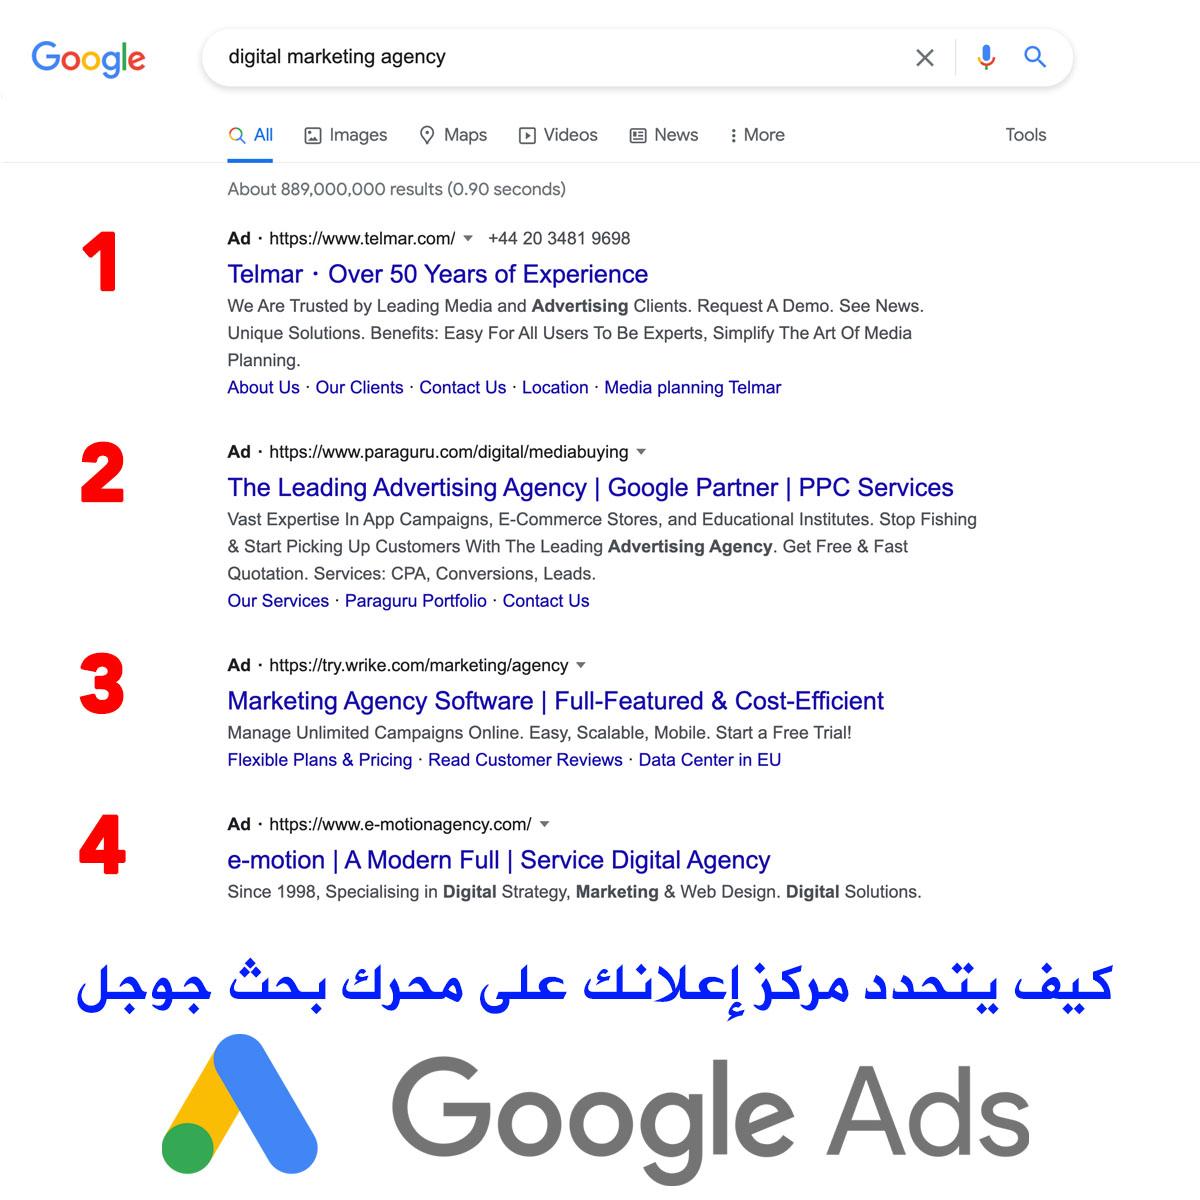 Google Ads Ranking